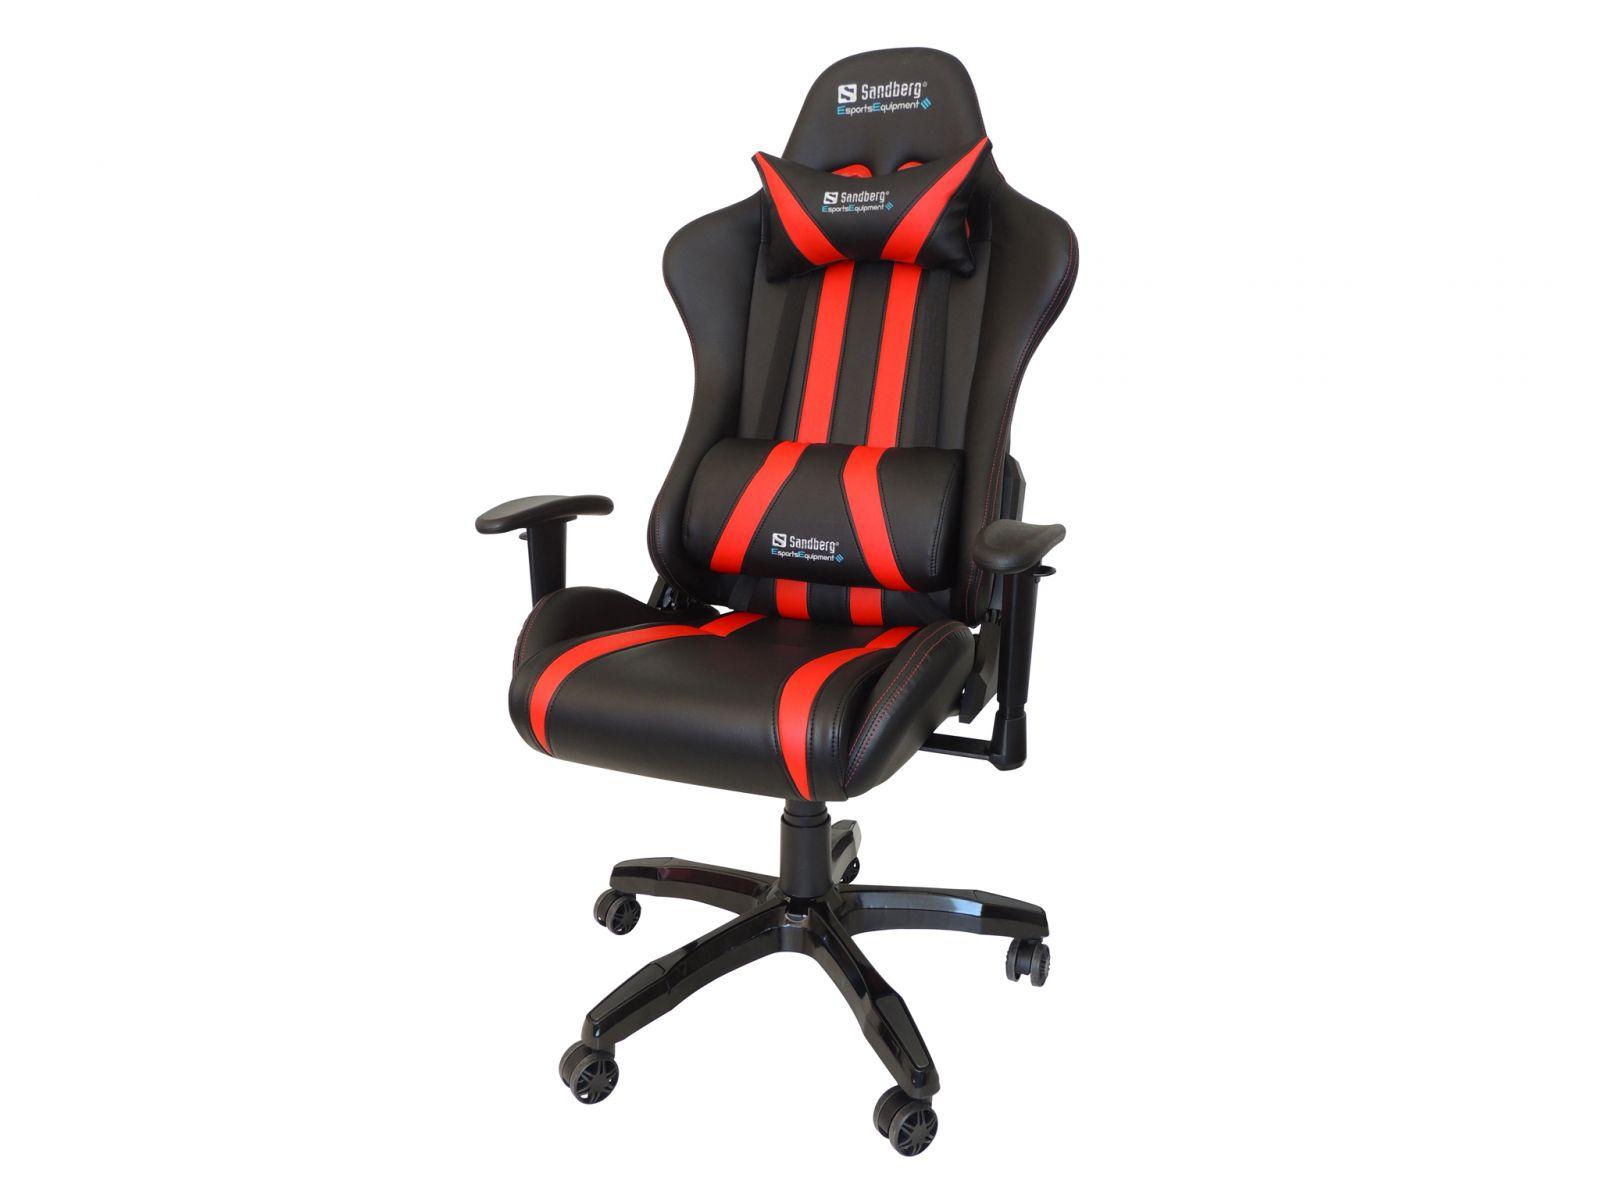 židle SANDBERG Commander - černočervená